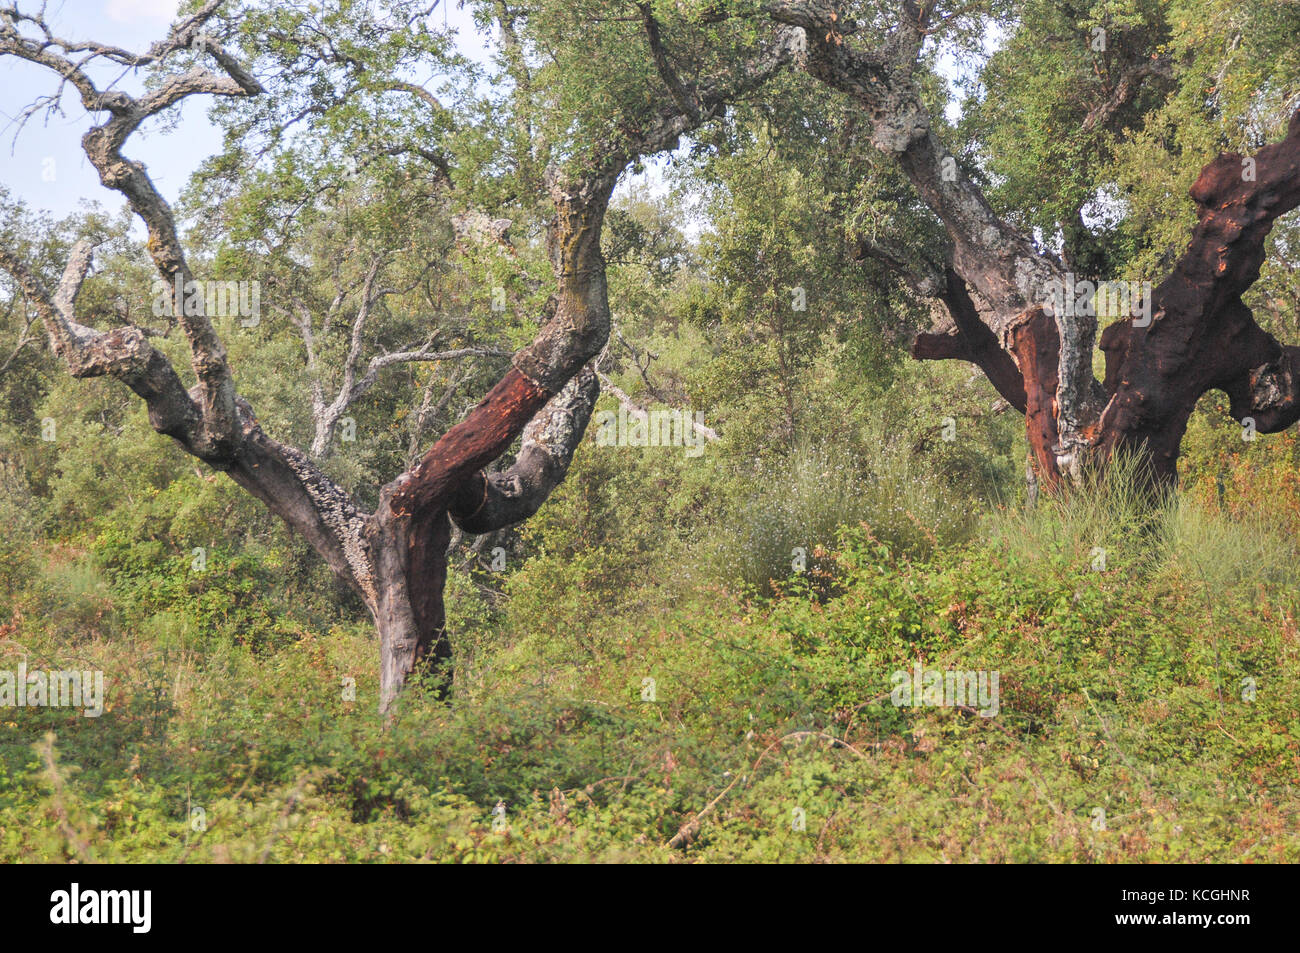 cork oak trees in Extremadura, Spain - Stock Image